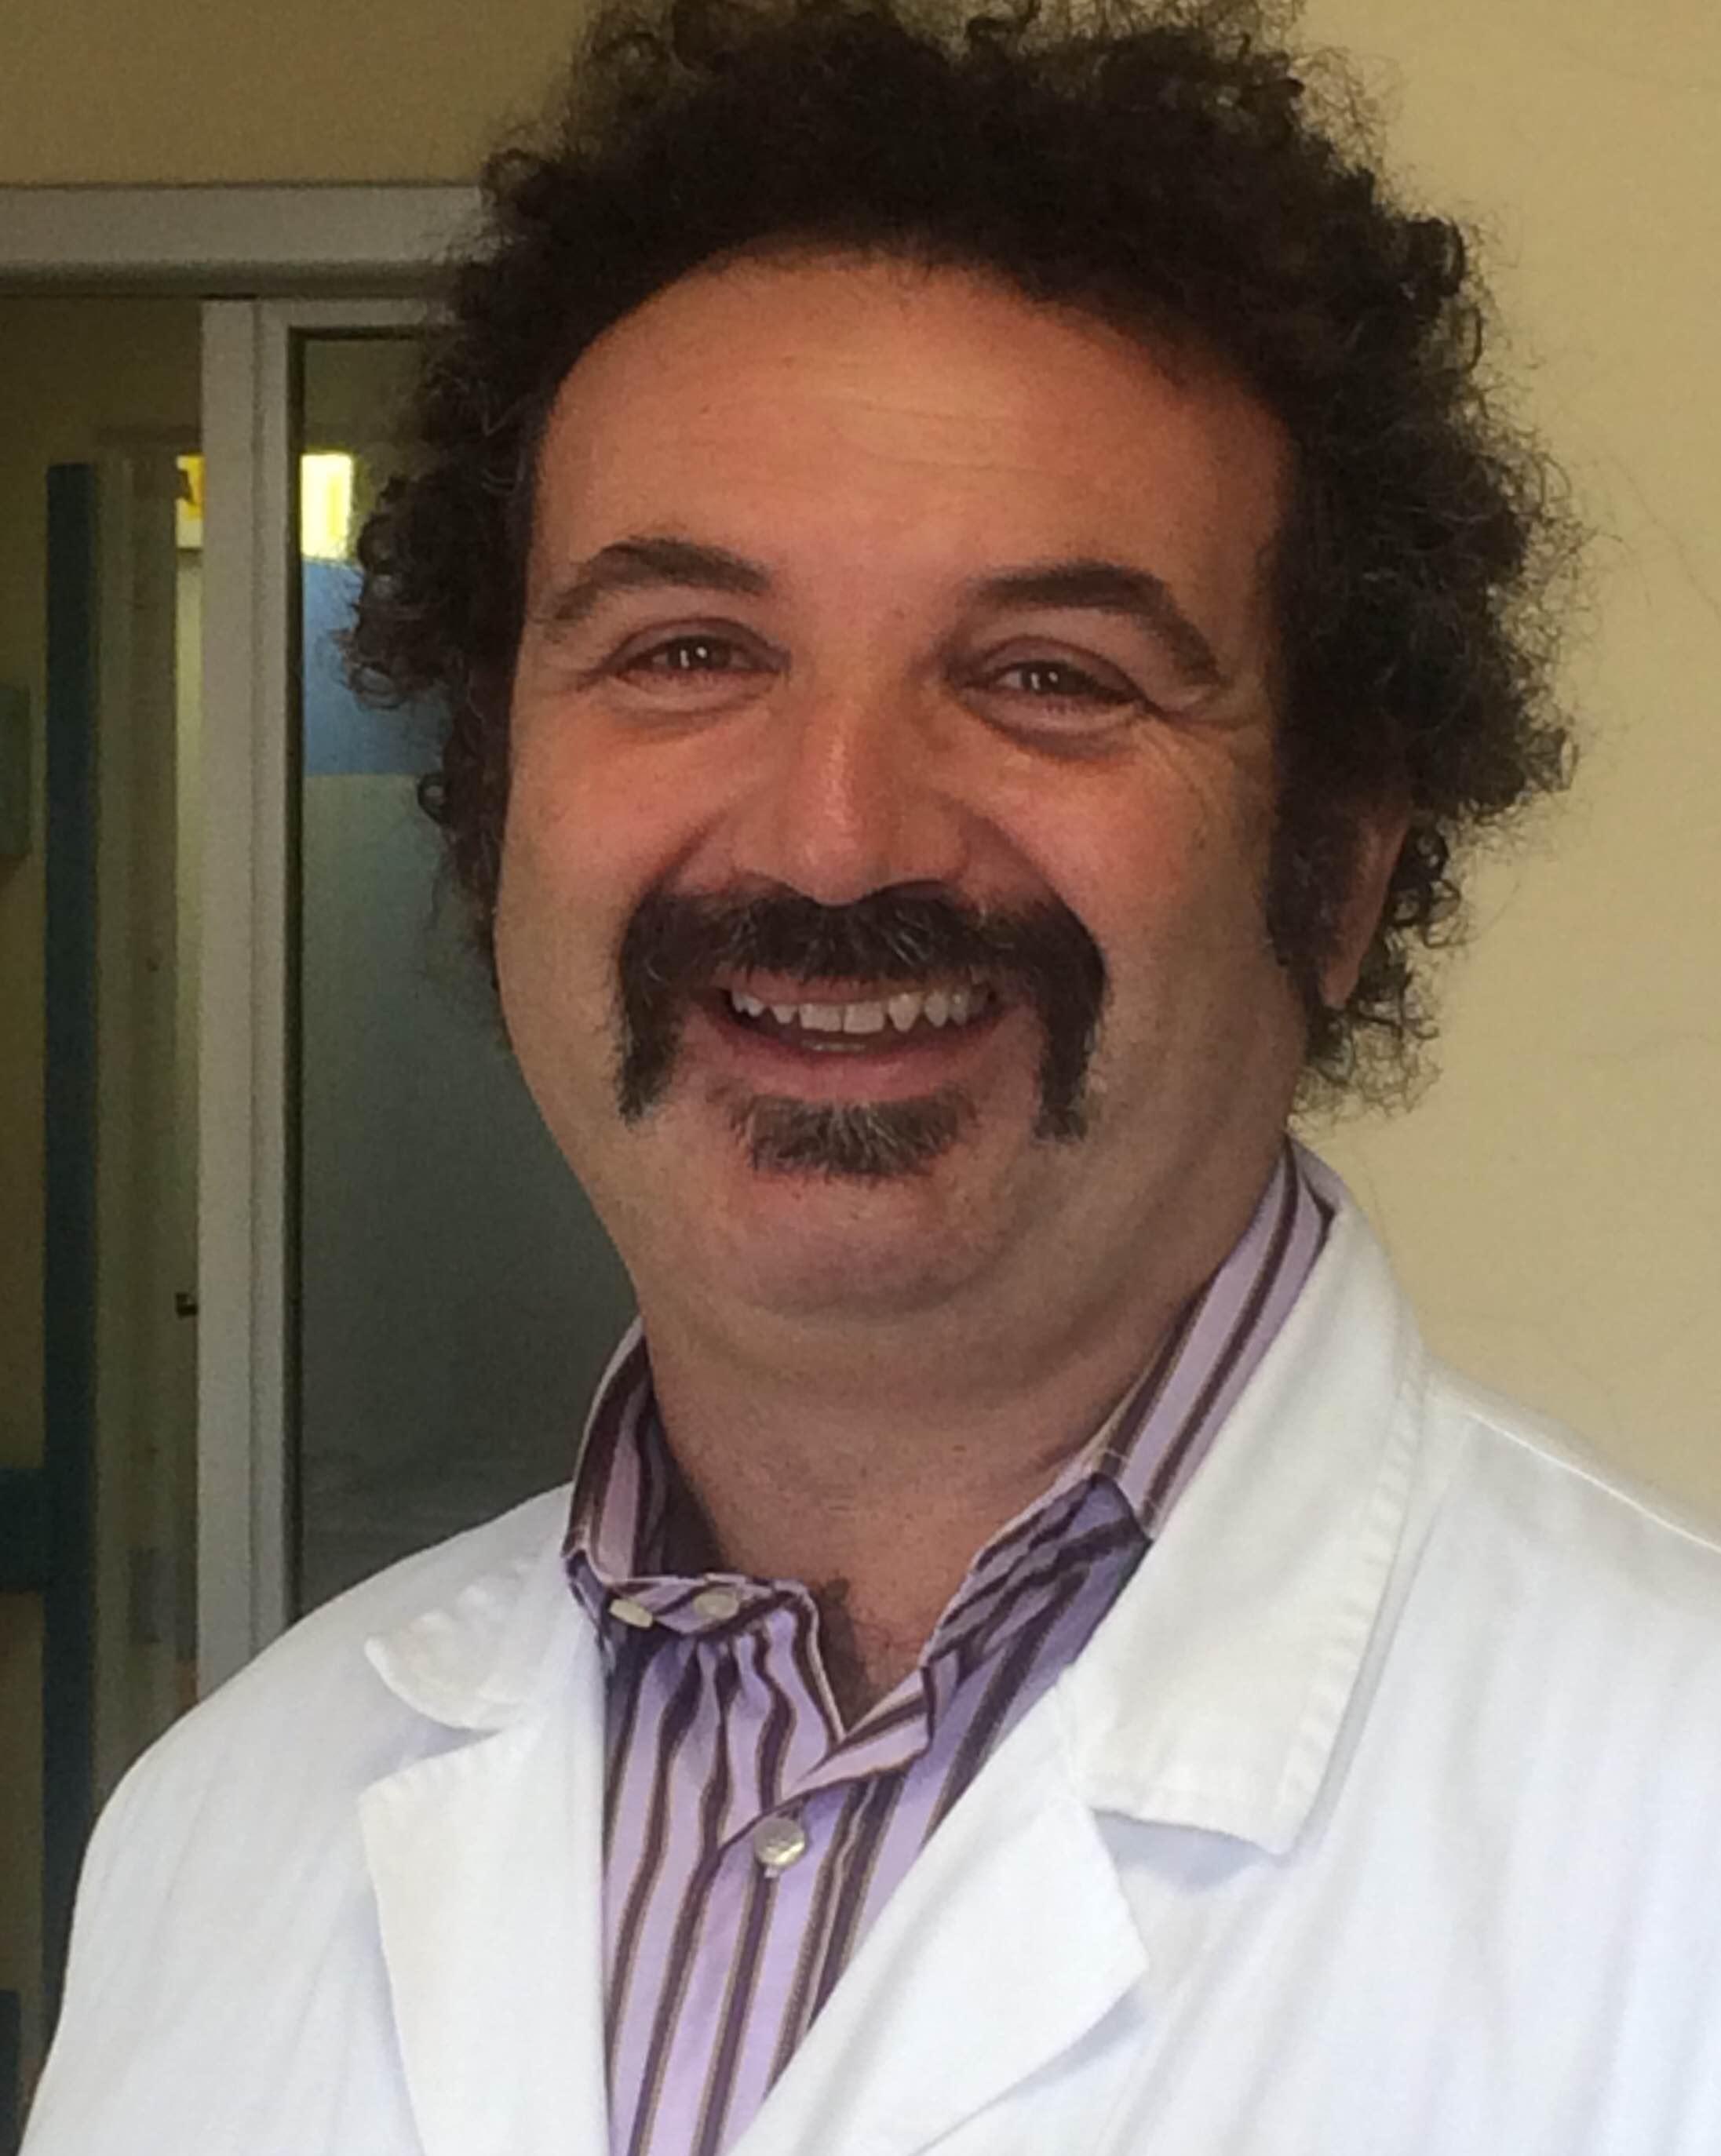 Domenico Antonio Restivo